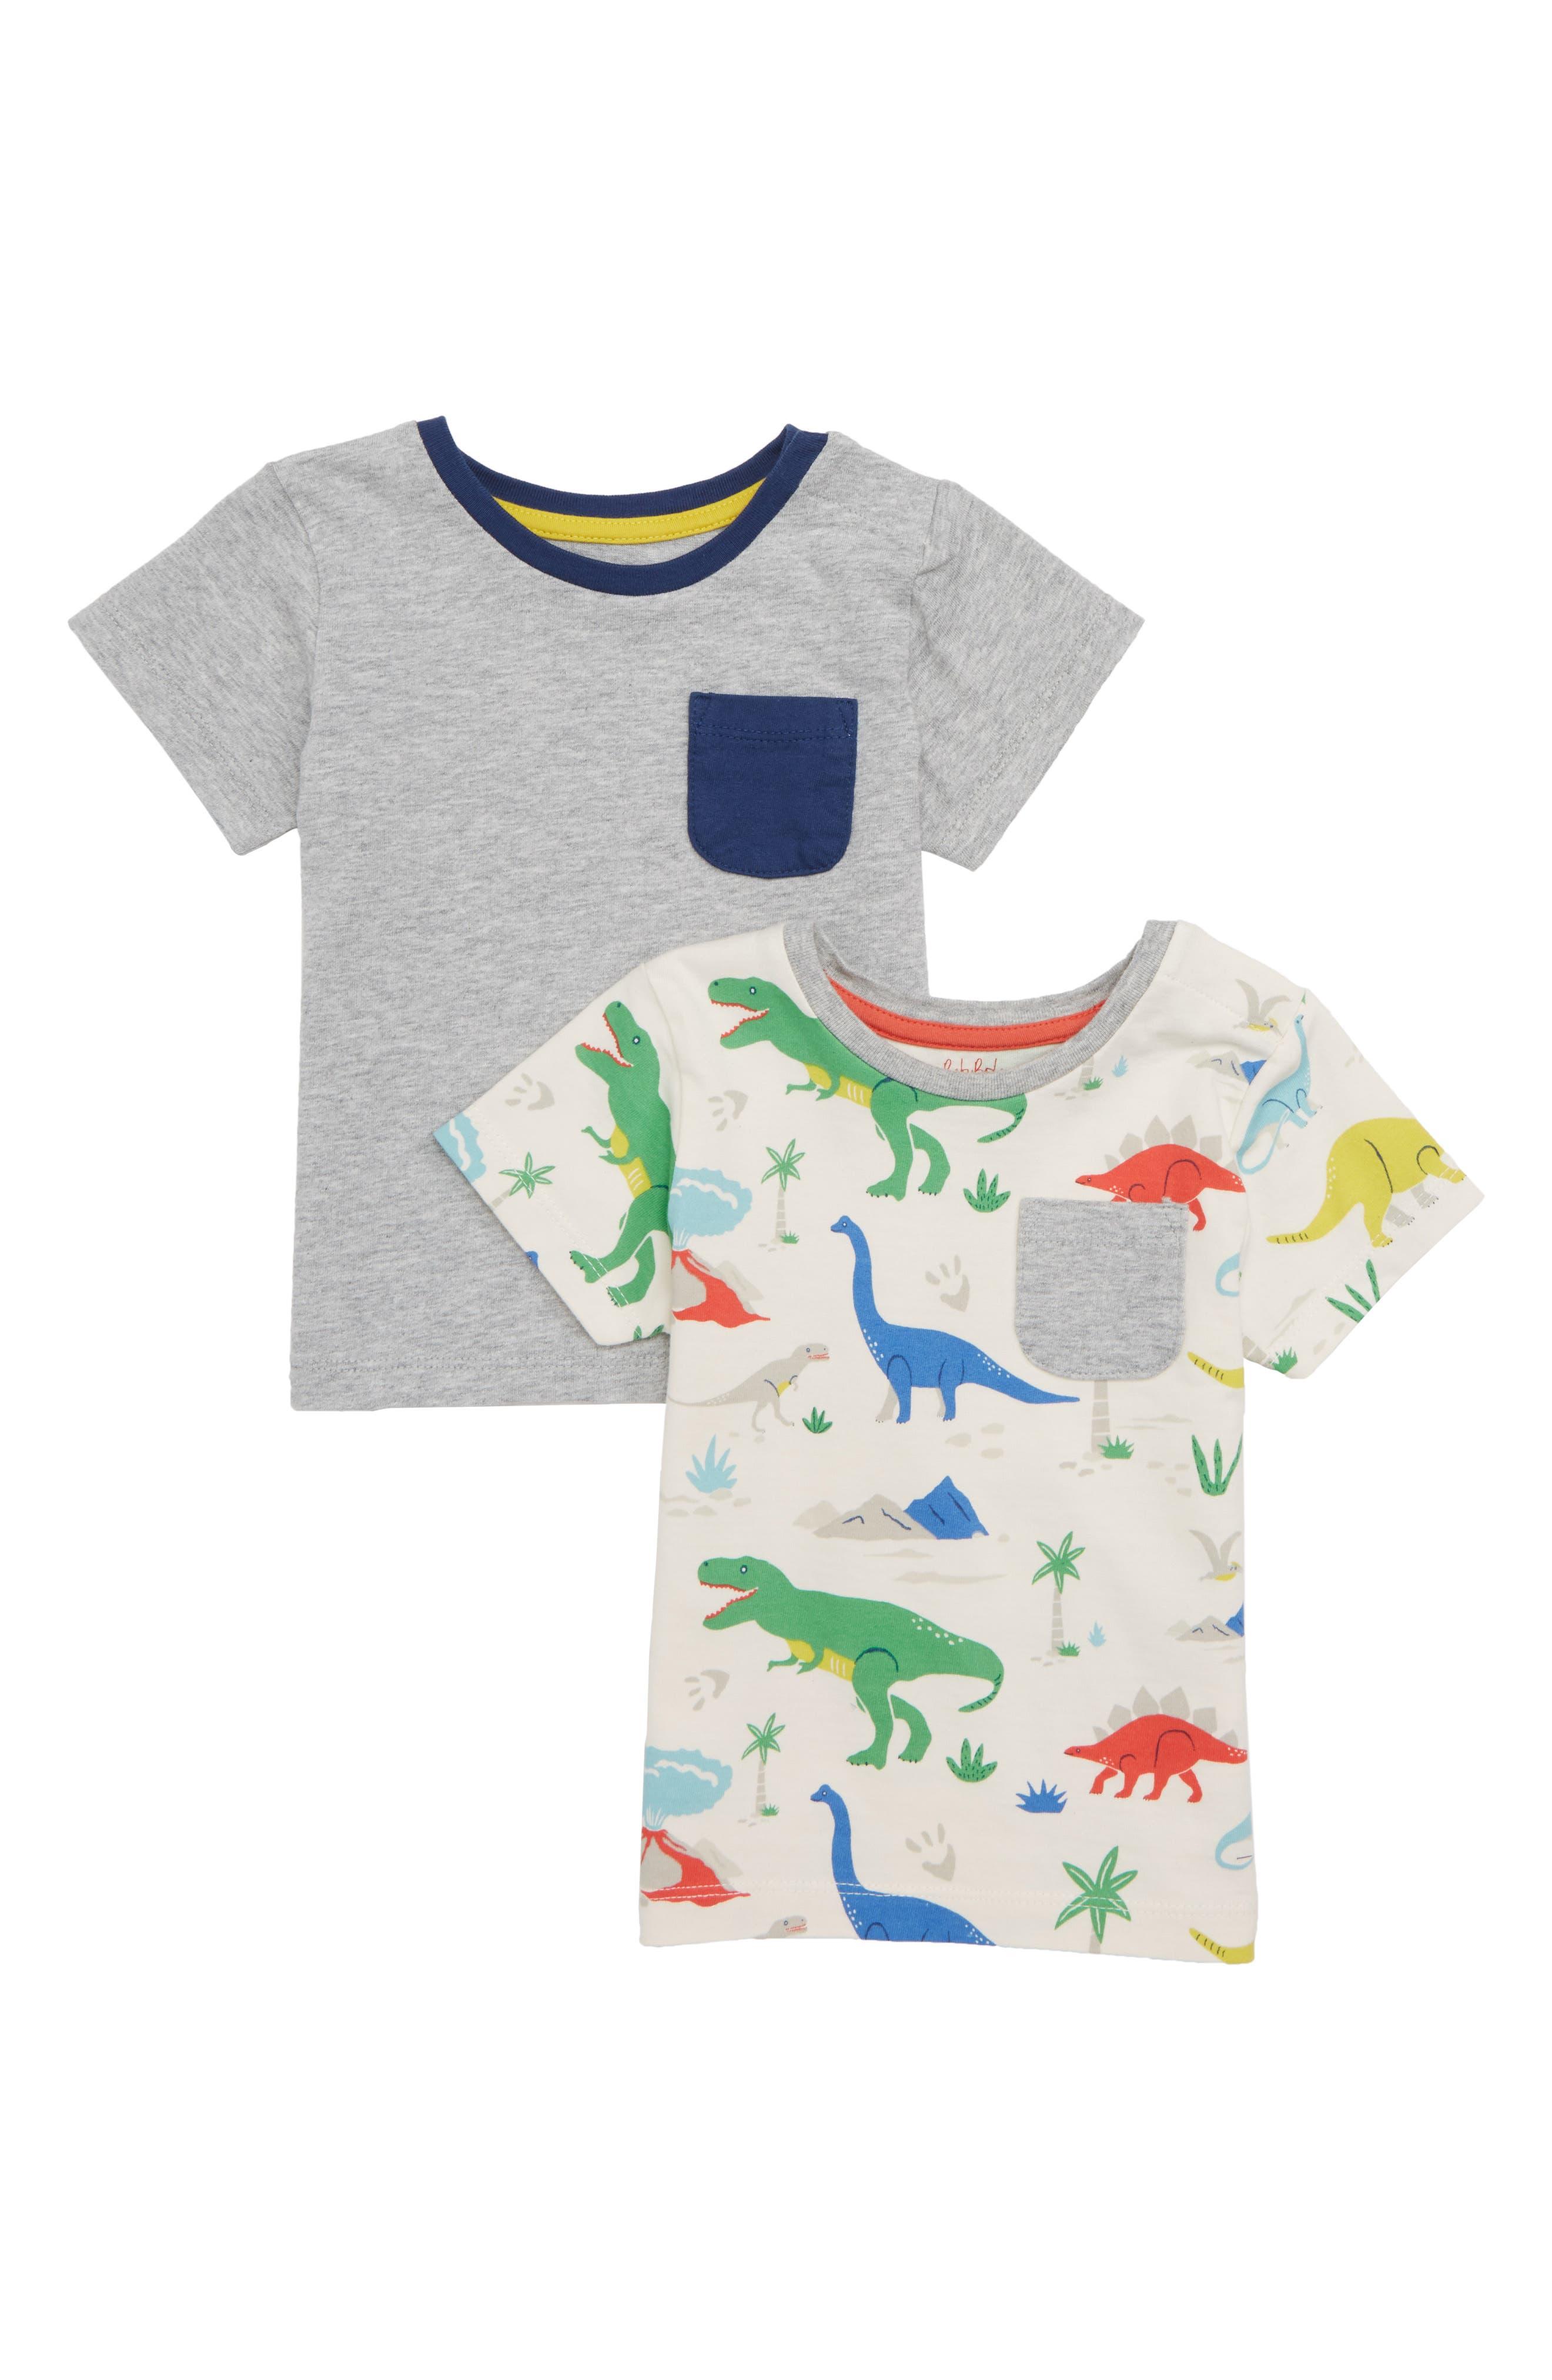 2-Pack T-Shirts,                         Main,                         color, Grey Marl/ Dinosauer